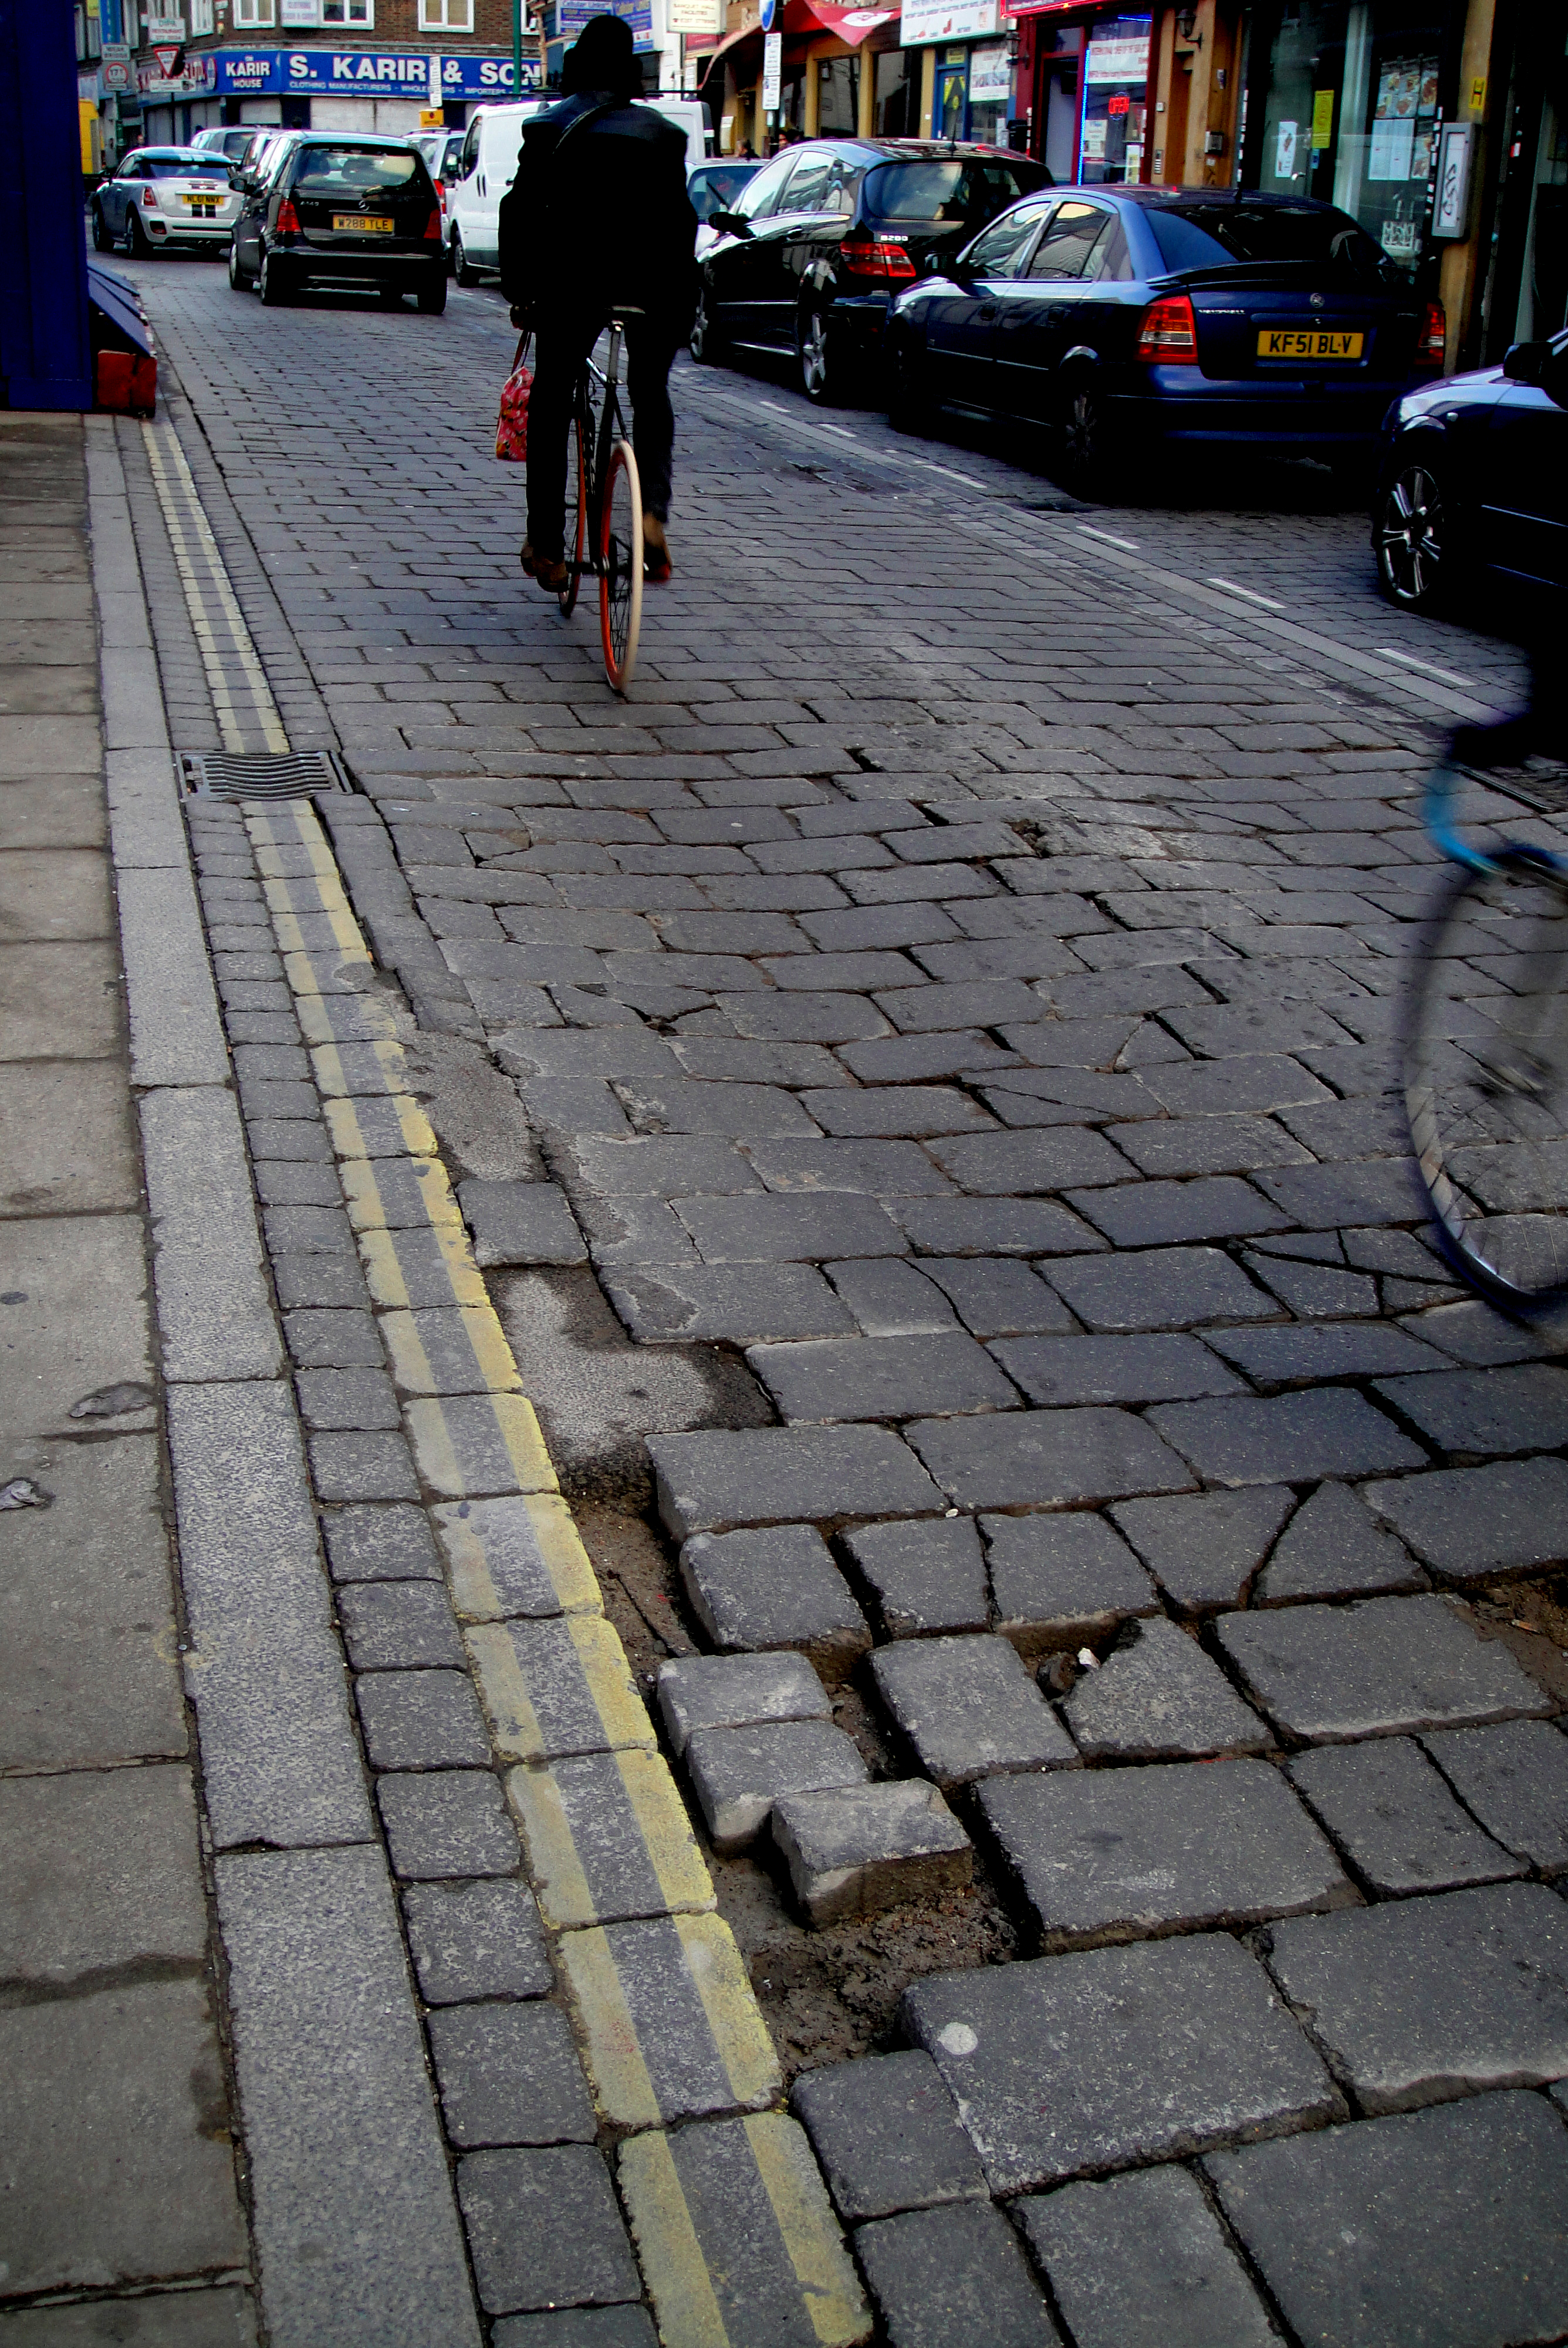 Brick Lane: A Few Bricks Short In Brick Lane…